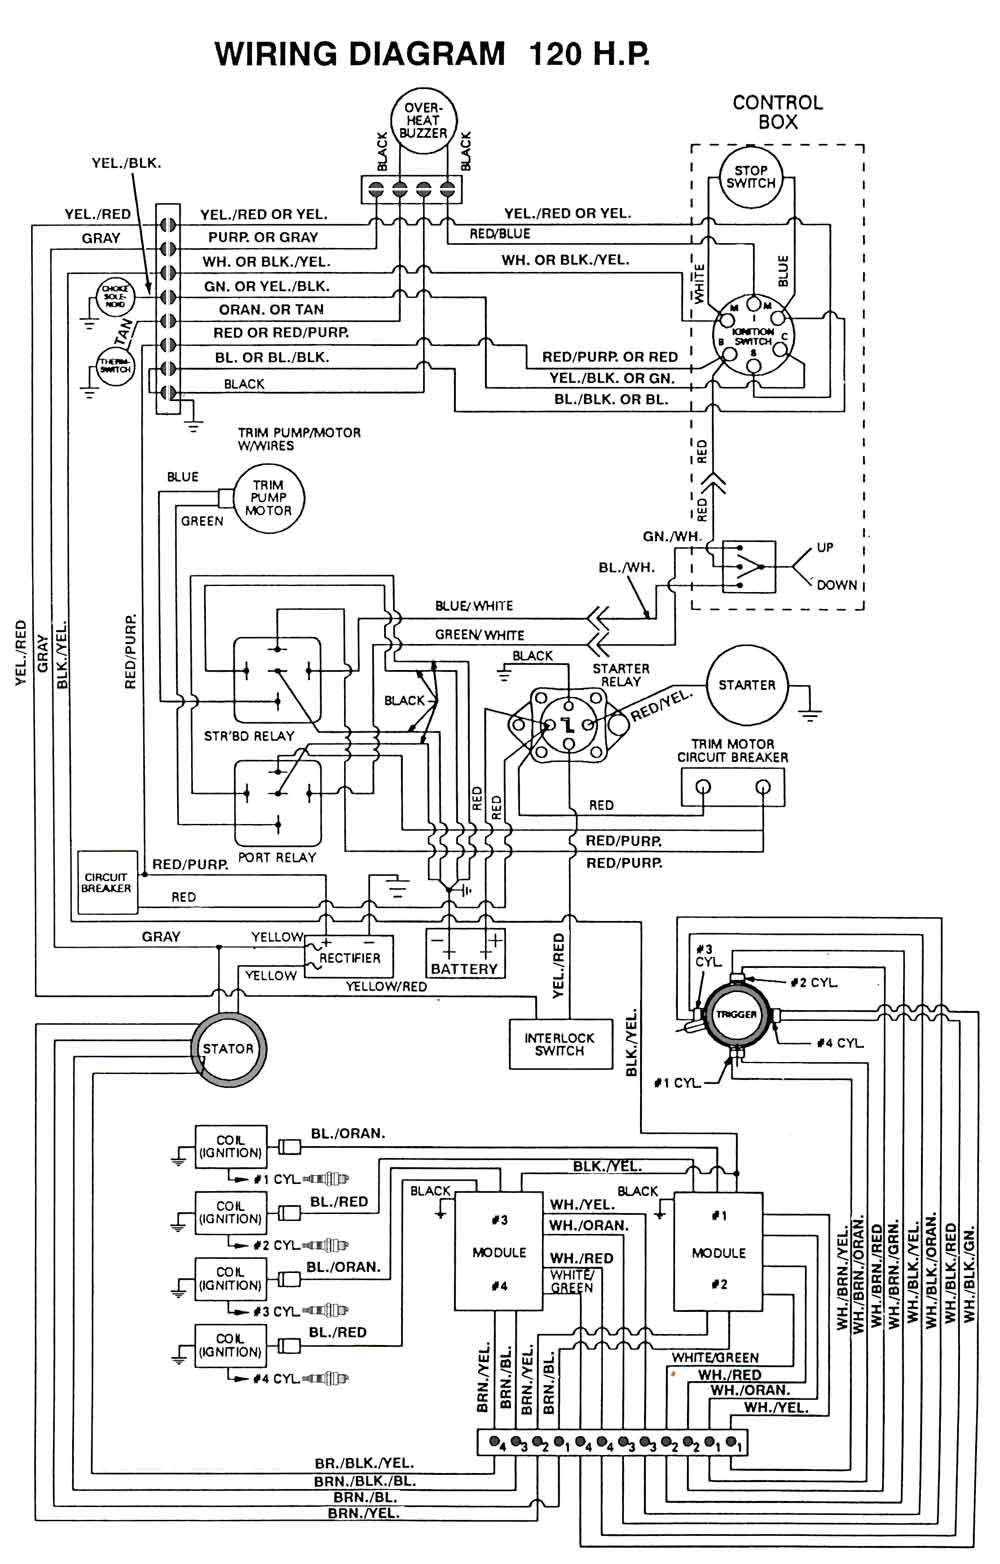 Diagram Omc Cobra Ignition Wiring Diagram Full Version Hd Quality Wiring Diagram Diagramm Discountdellapiastrella It